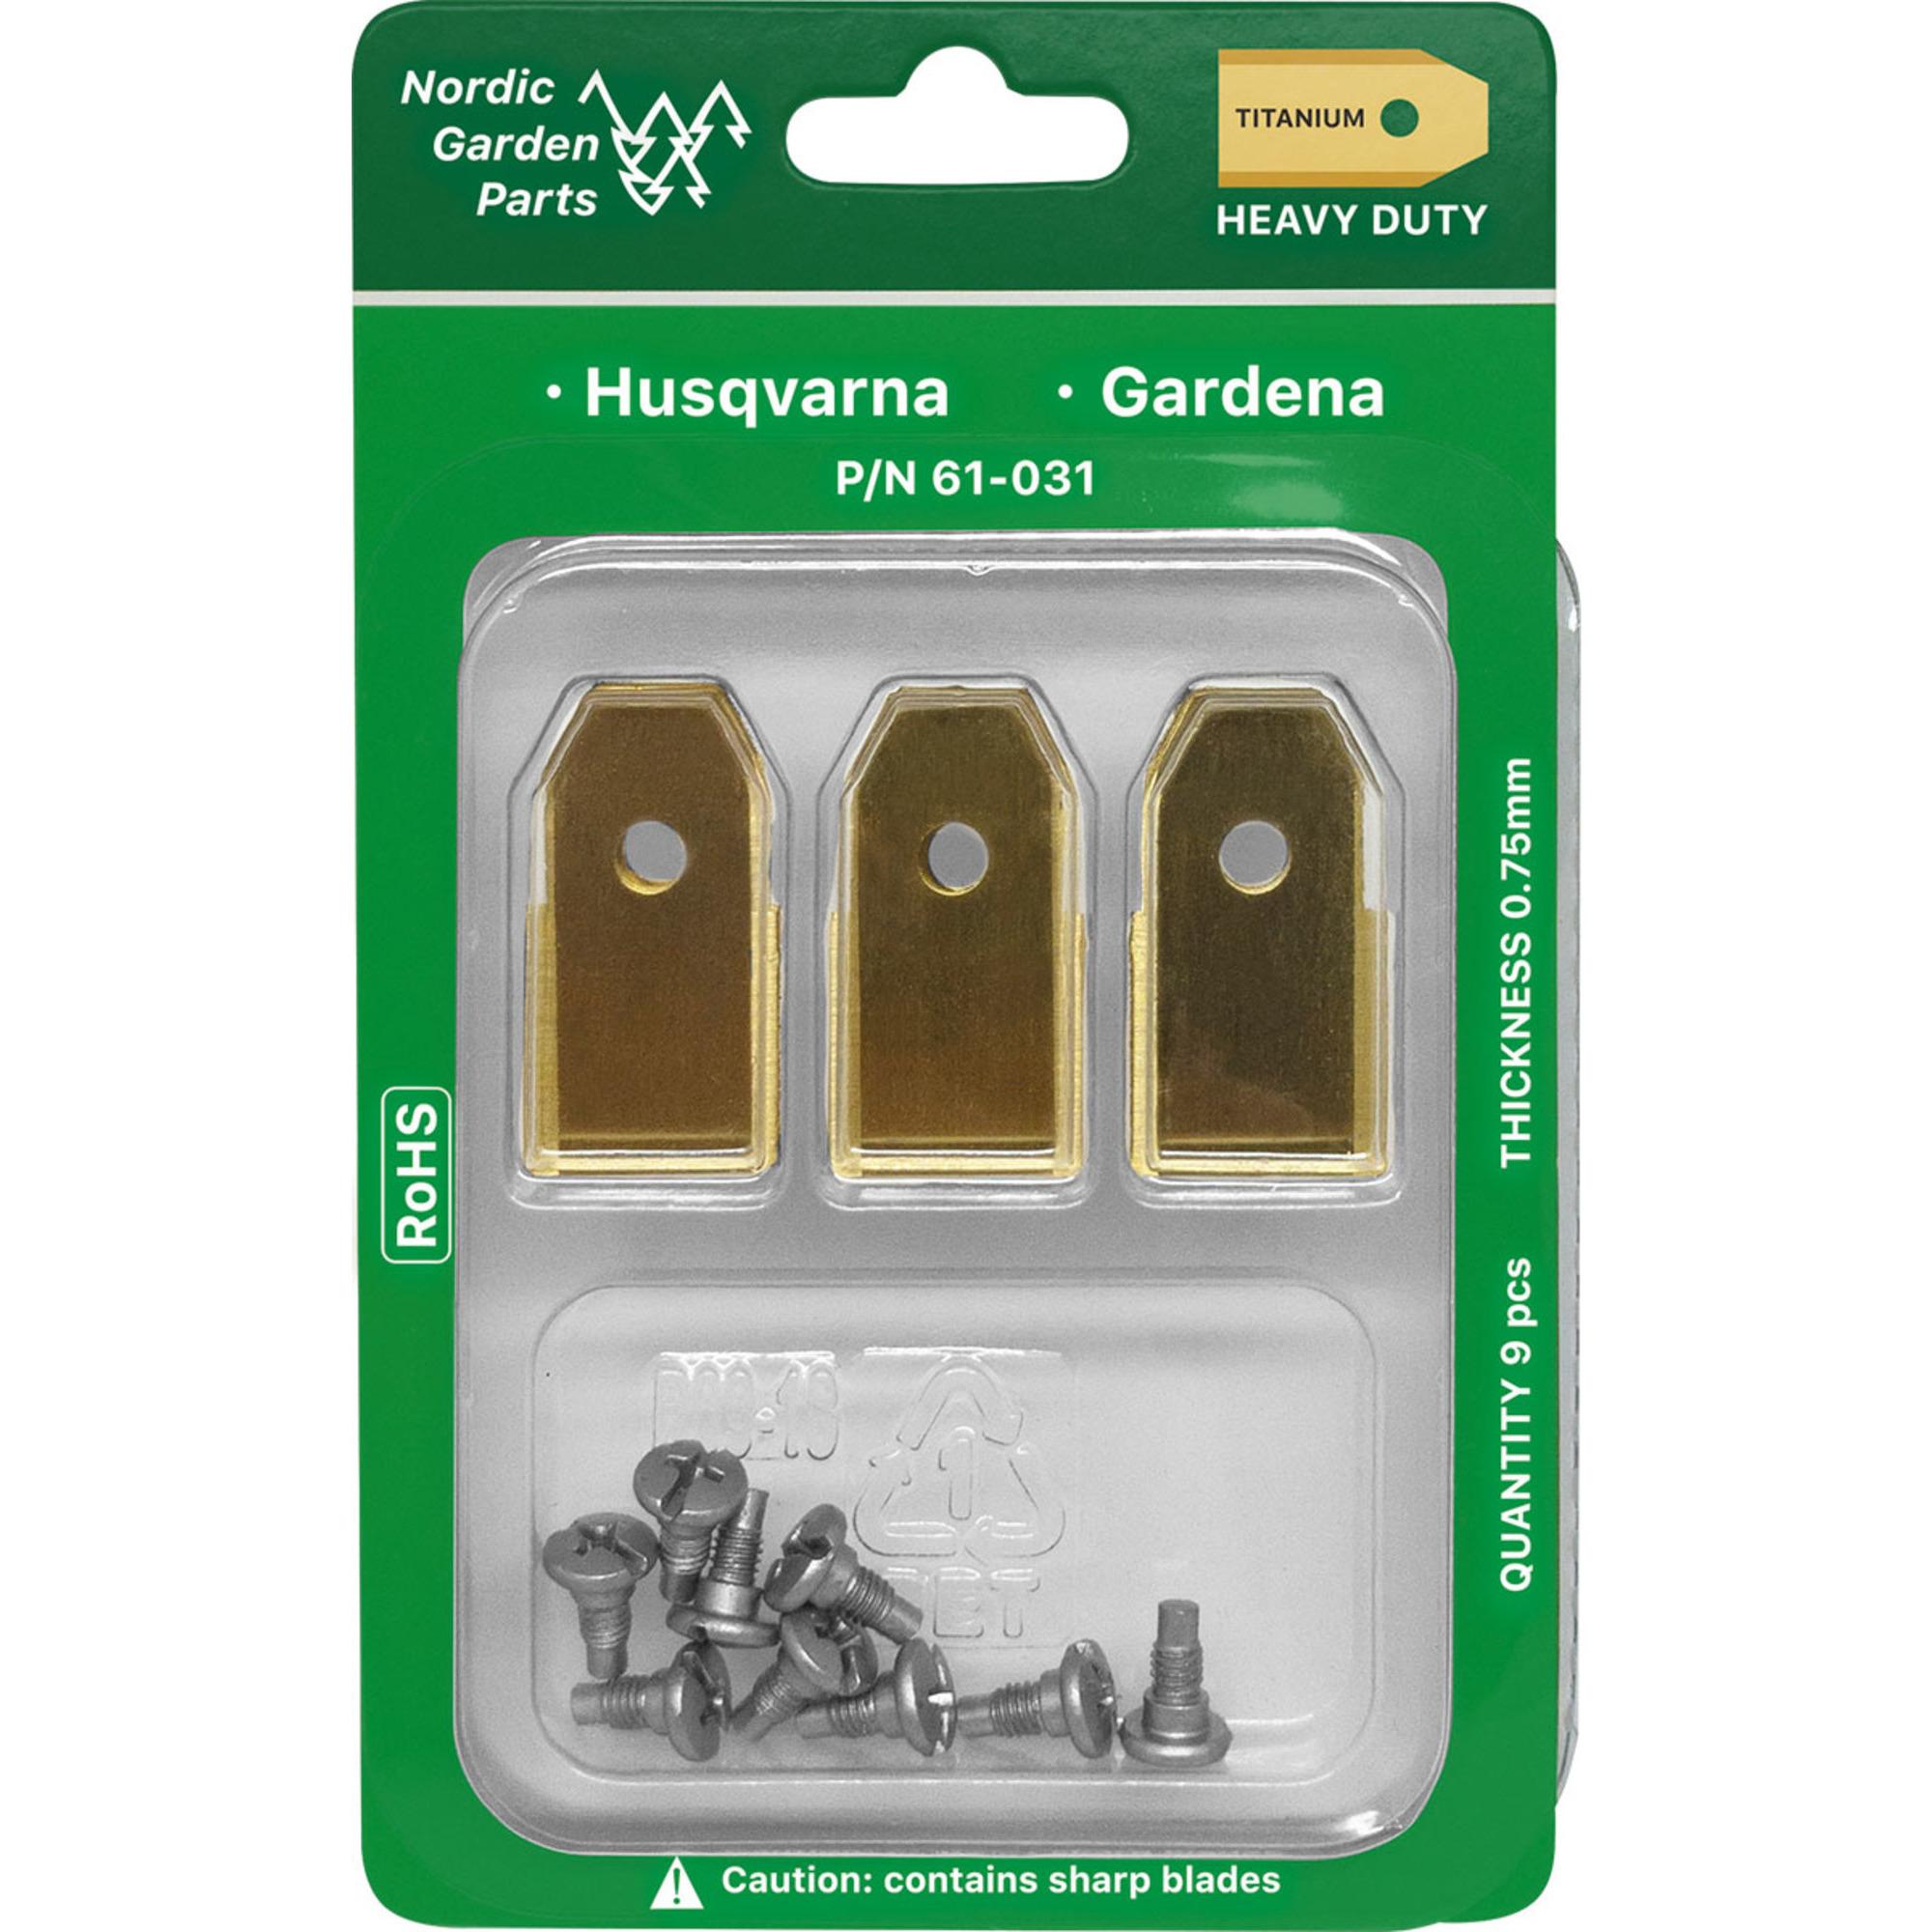 Nordic Garden Parts Titanbelagda knivar 0,75 mm 9 st.